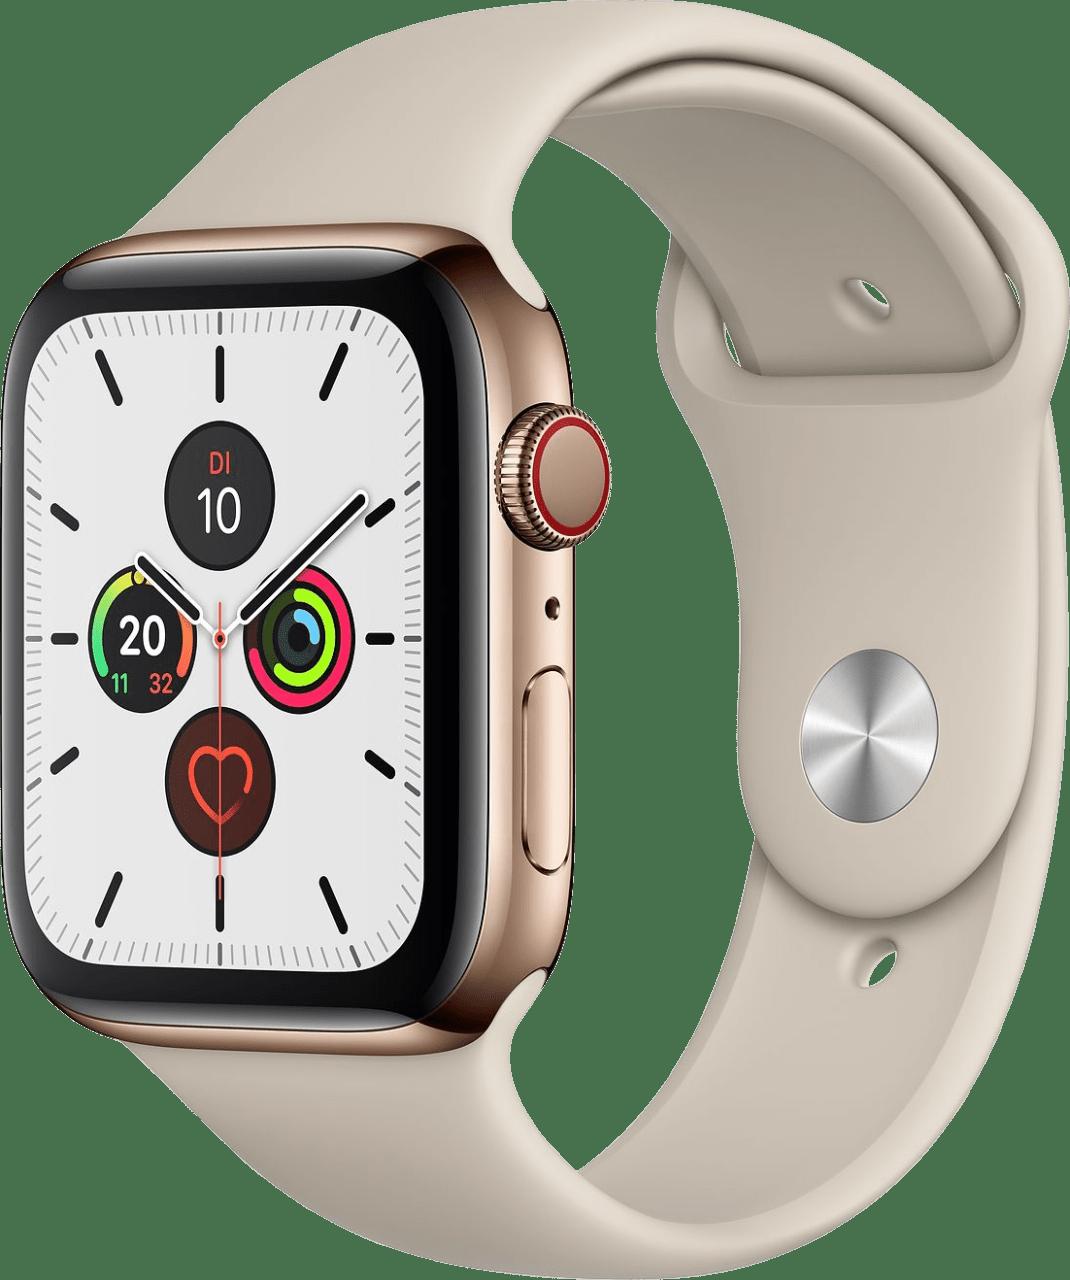 Stein Apple Watch Series 5 GPS + Cellular, 44-mm-Edelstahlgehäuse, Sportarmband.2